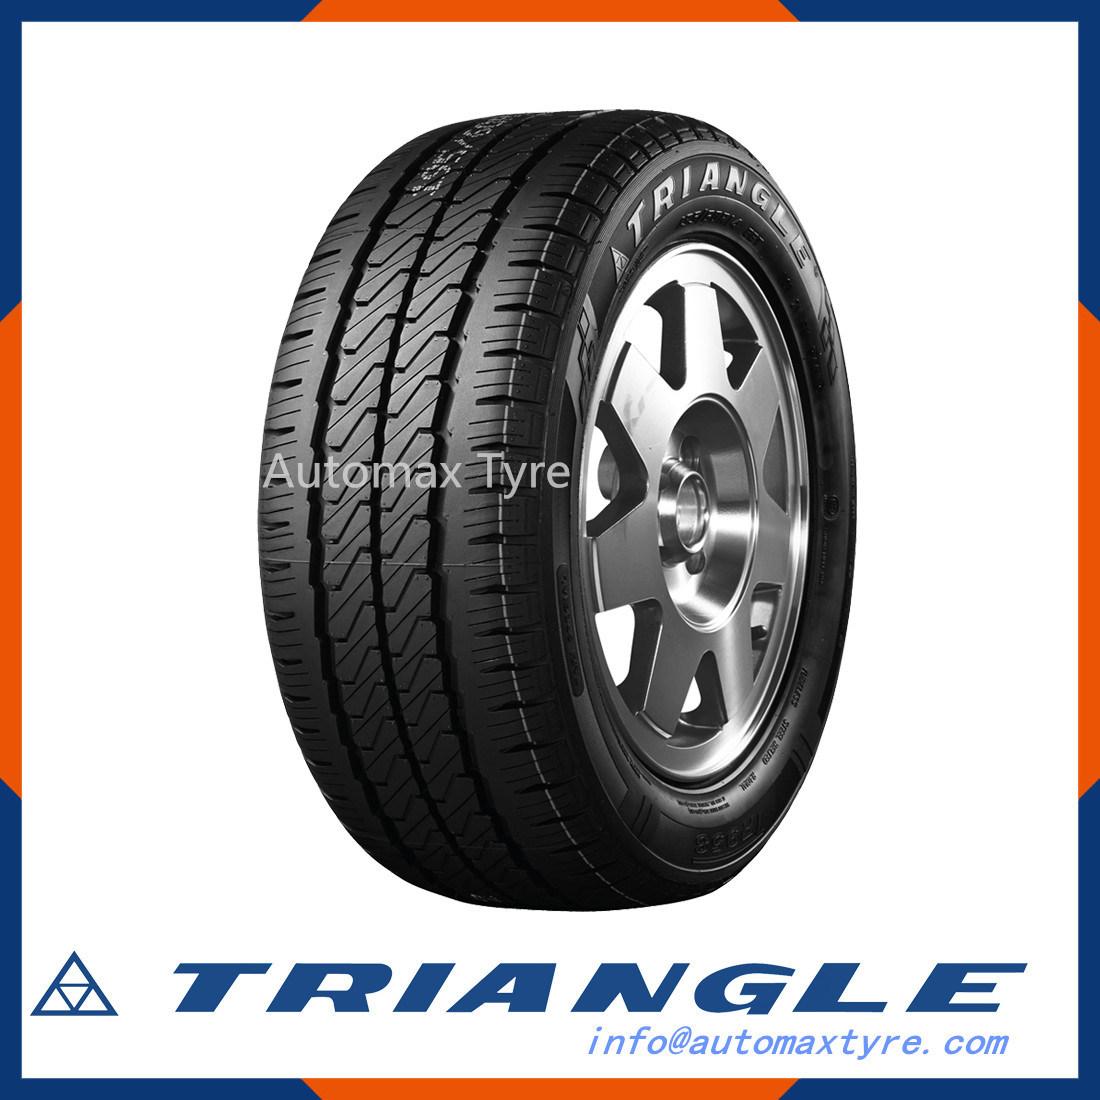 Tr958 Trangle China Big Shoulder Block Triangle Brand All Sean Car Tires